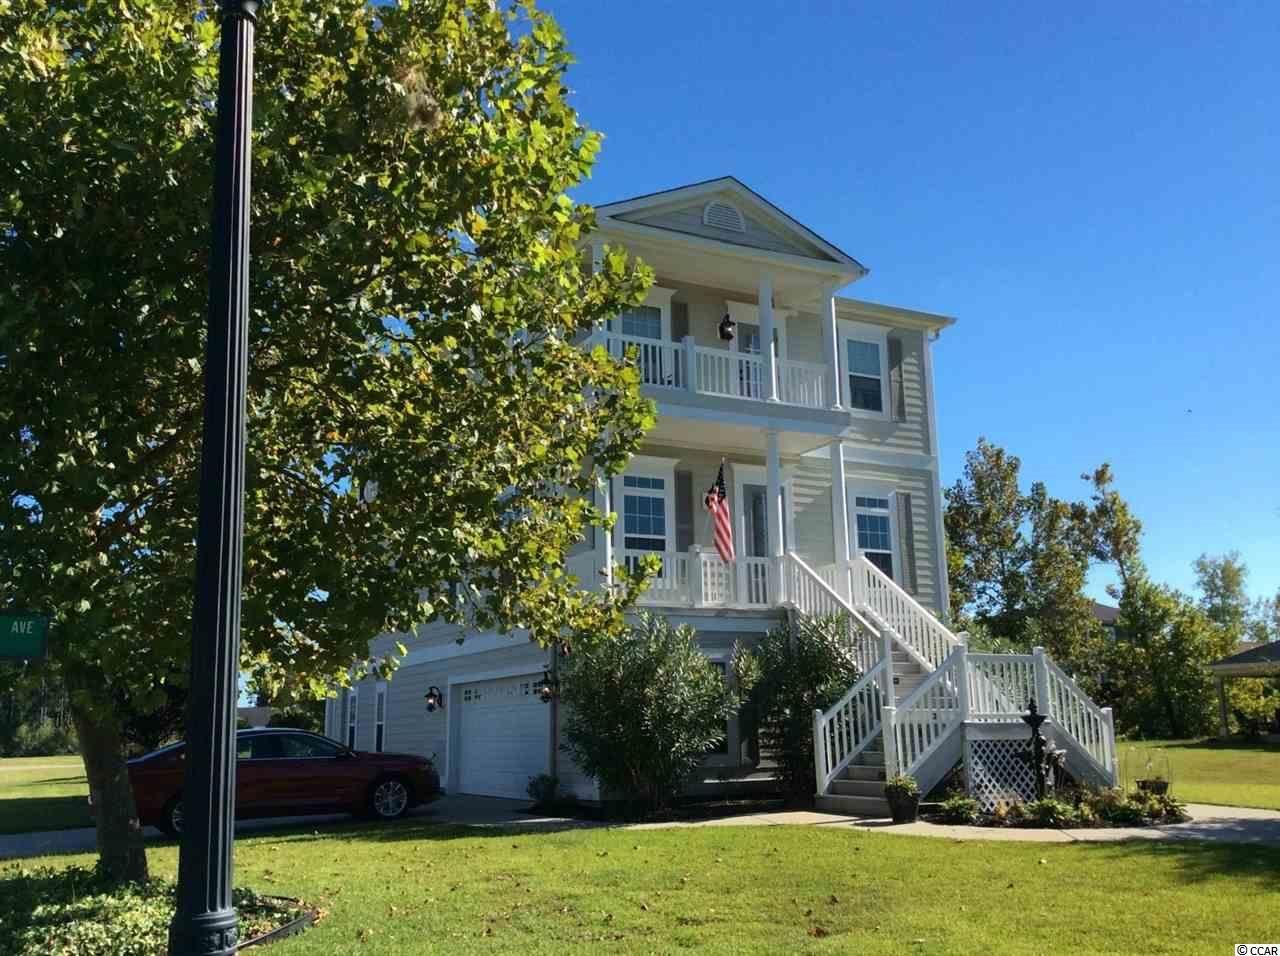 924 Shipmaster Ave., Myrtle Beach, SC 29579 - MLS#: 2026115